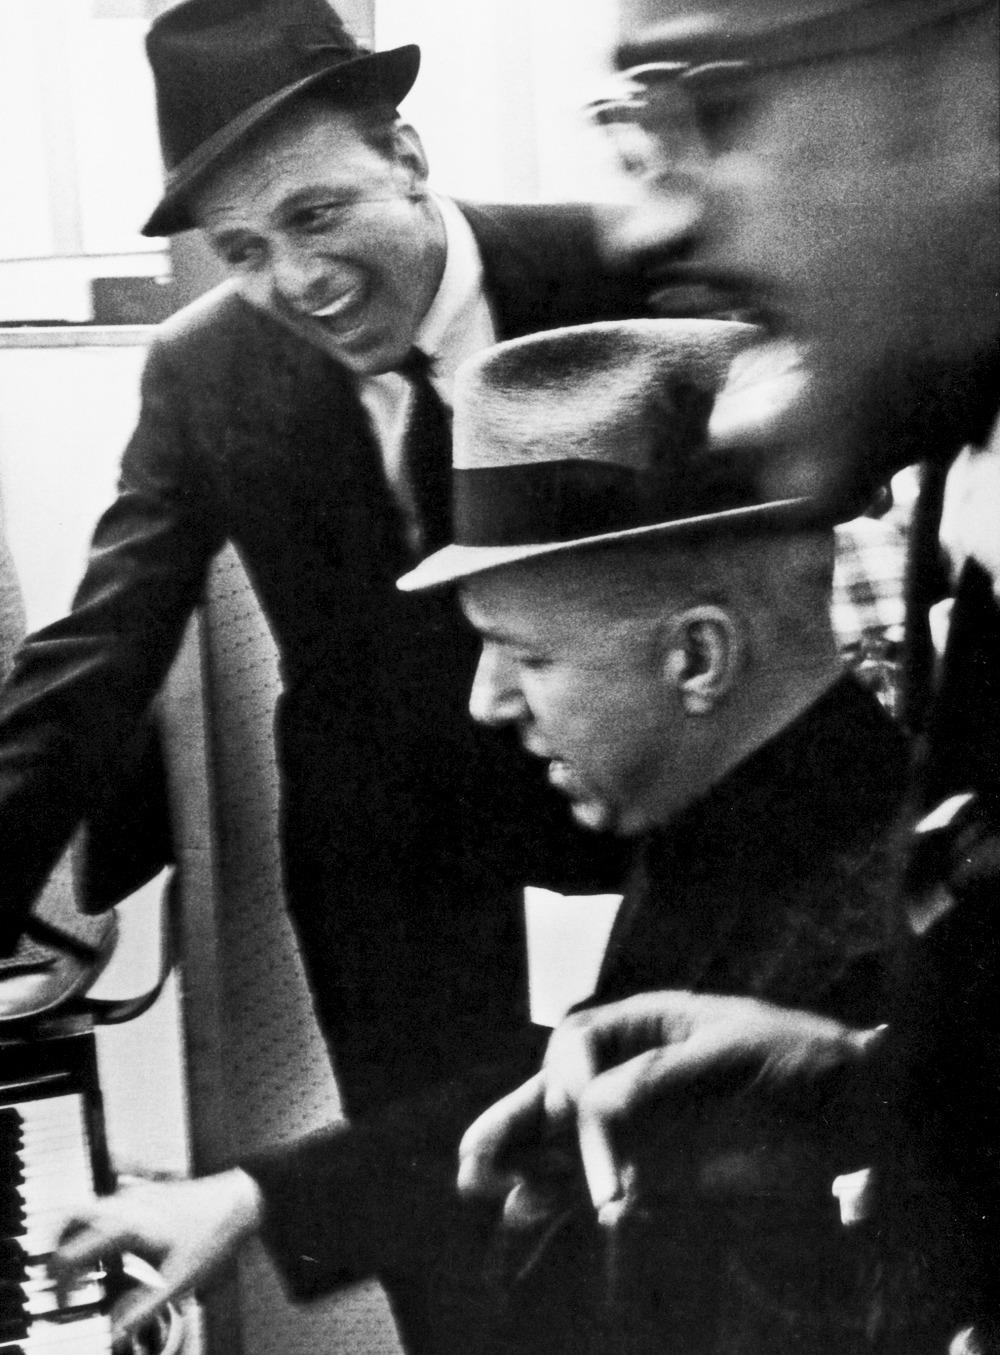 Frank Sinatra, Jimmy Van Heusen and Sammy Davis Jr. photographed by Phil Stern, ca. 1955.